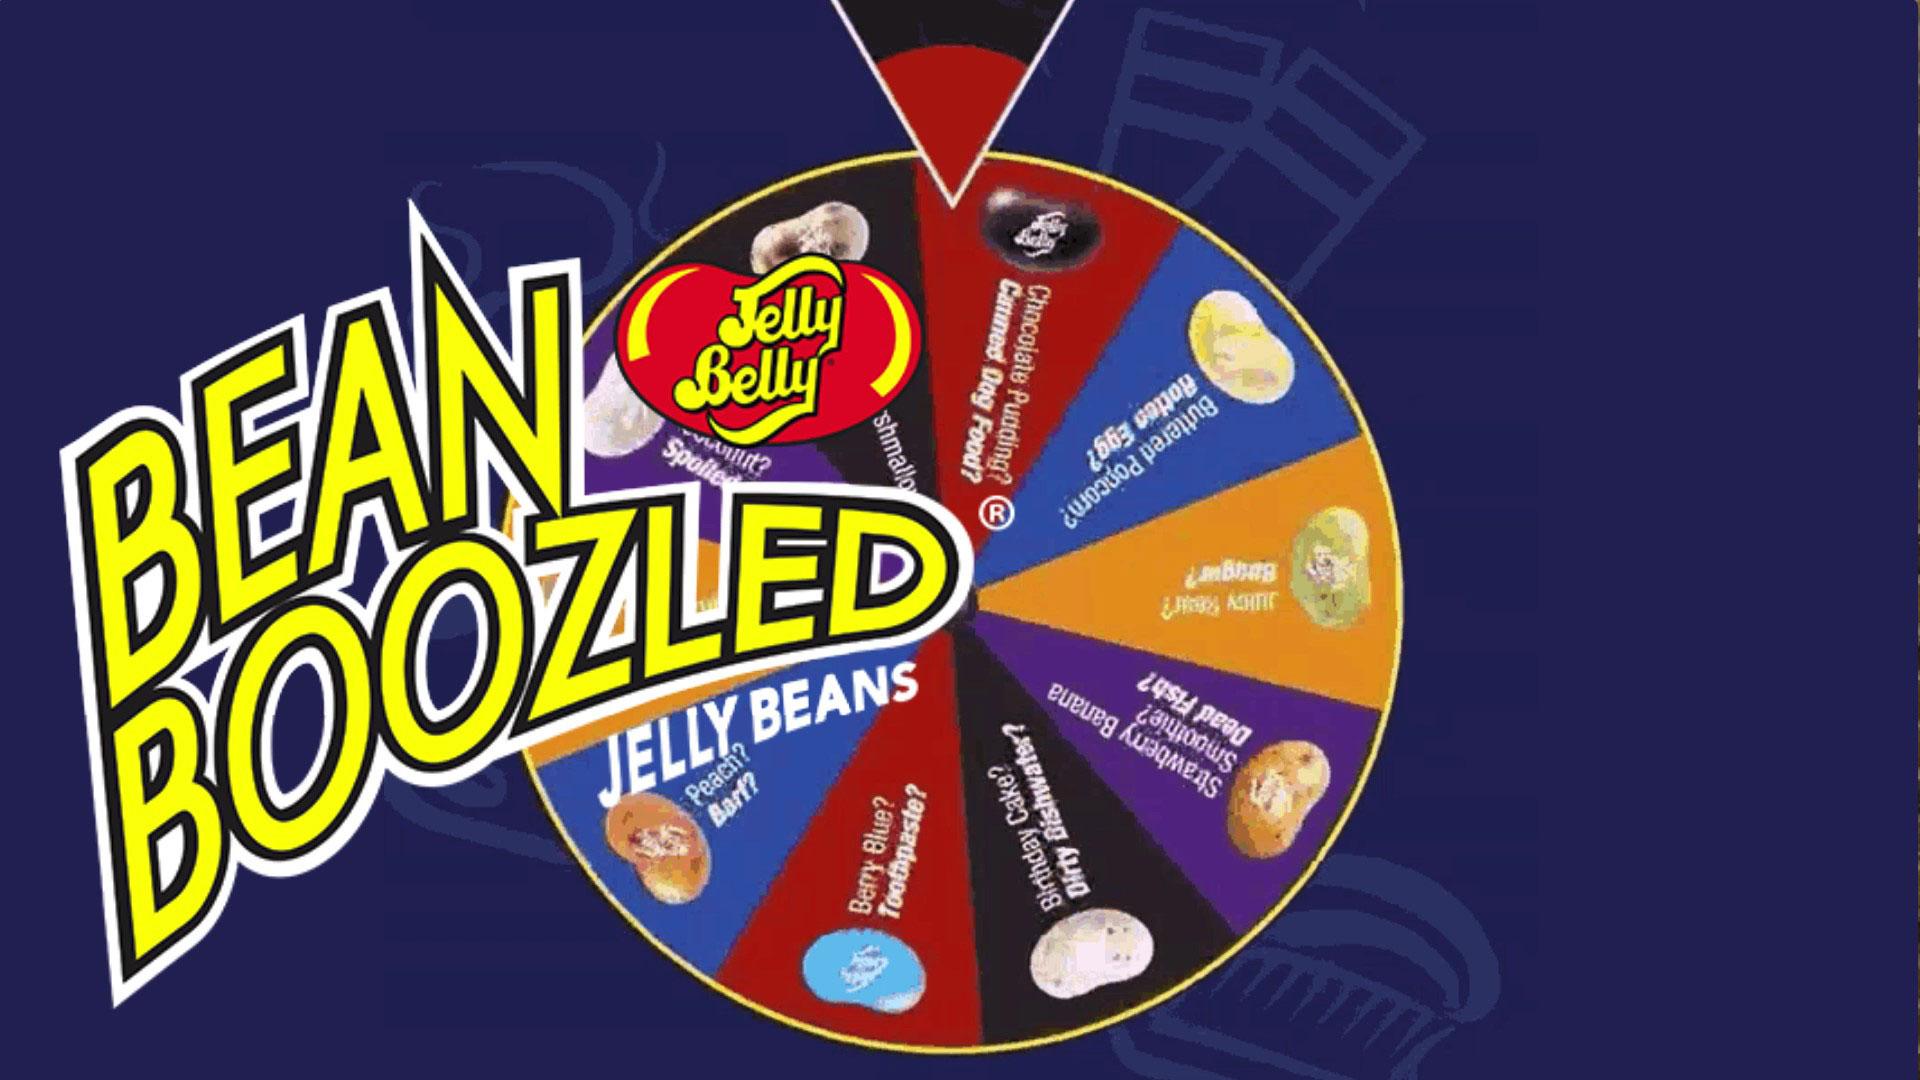 Bean Boozled Episode 2 - Redstone gci